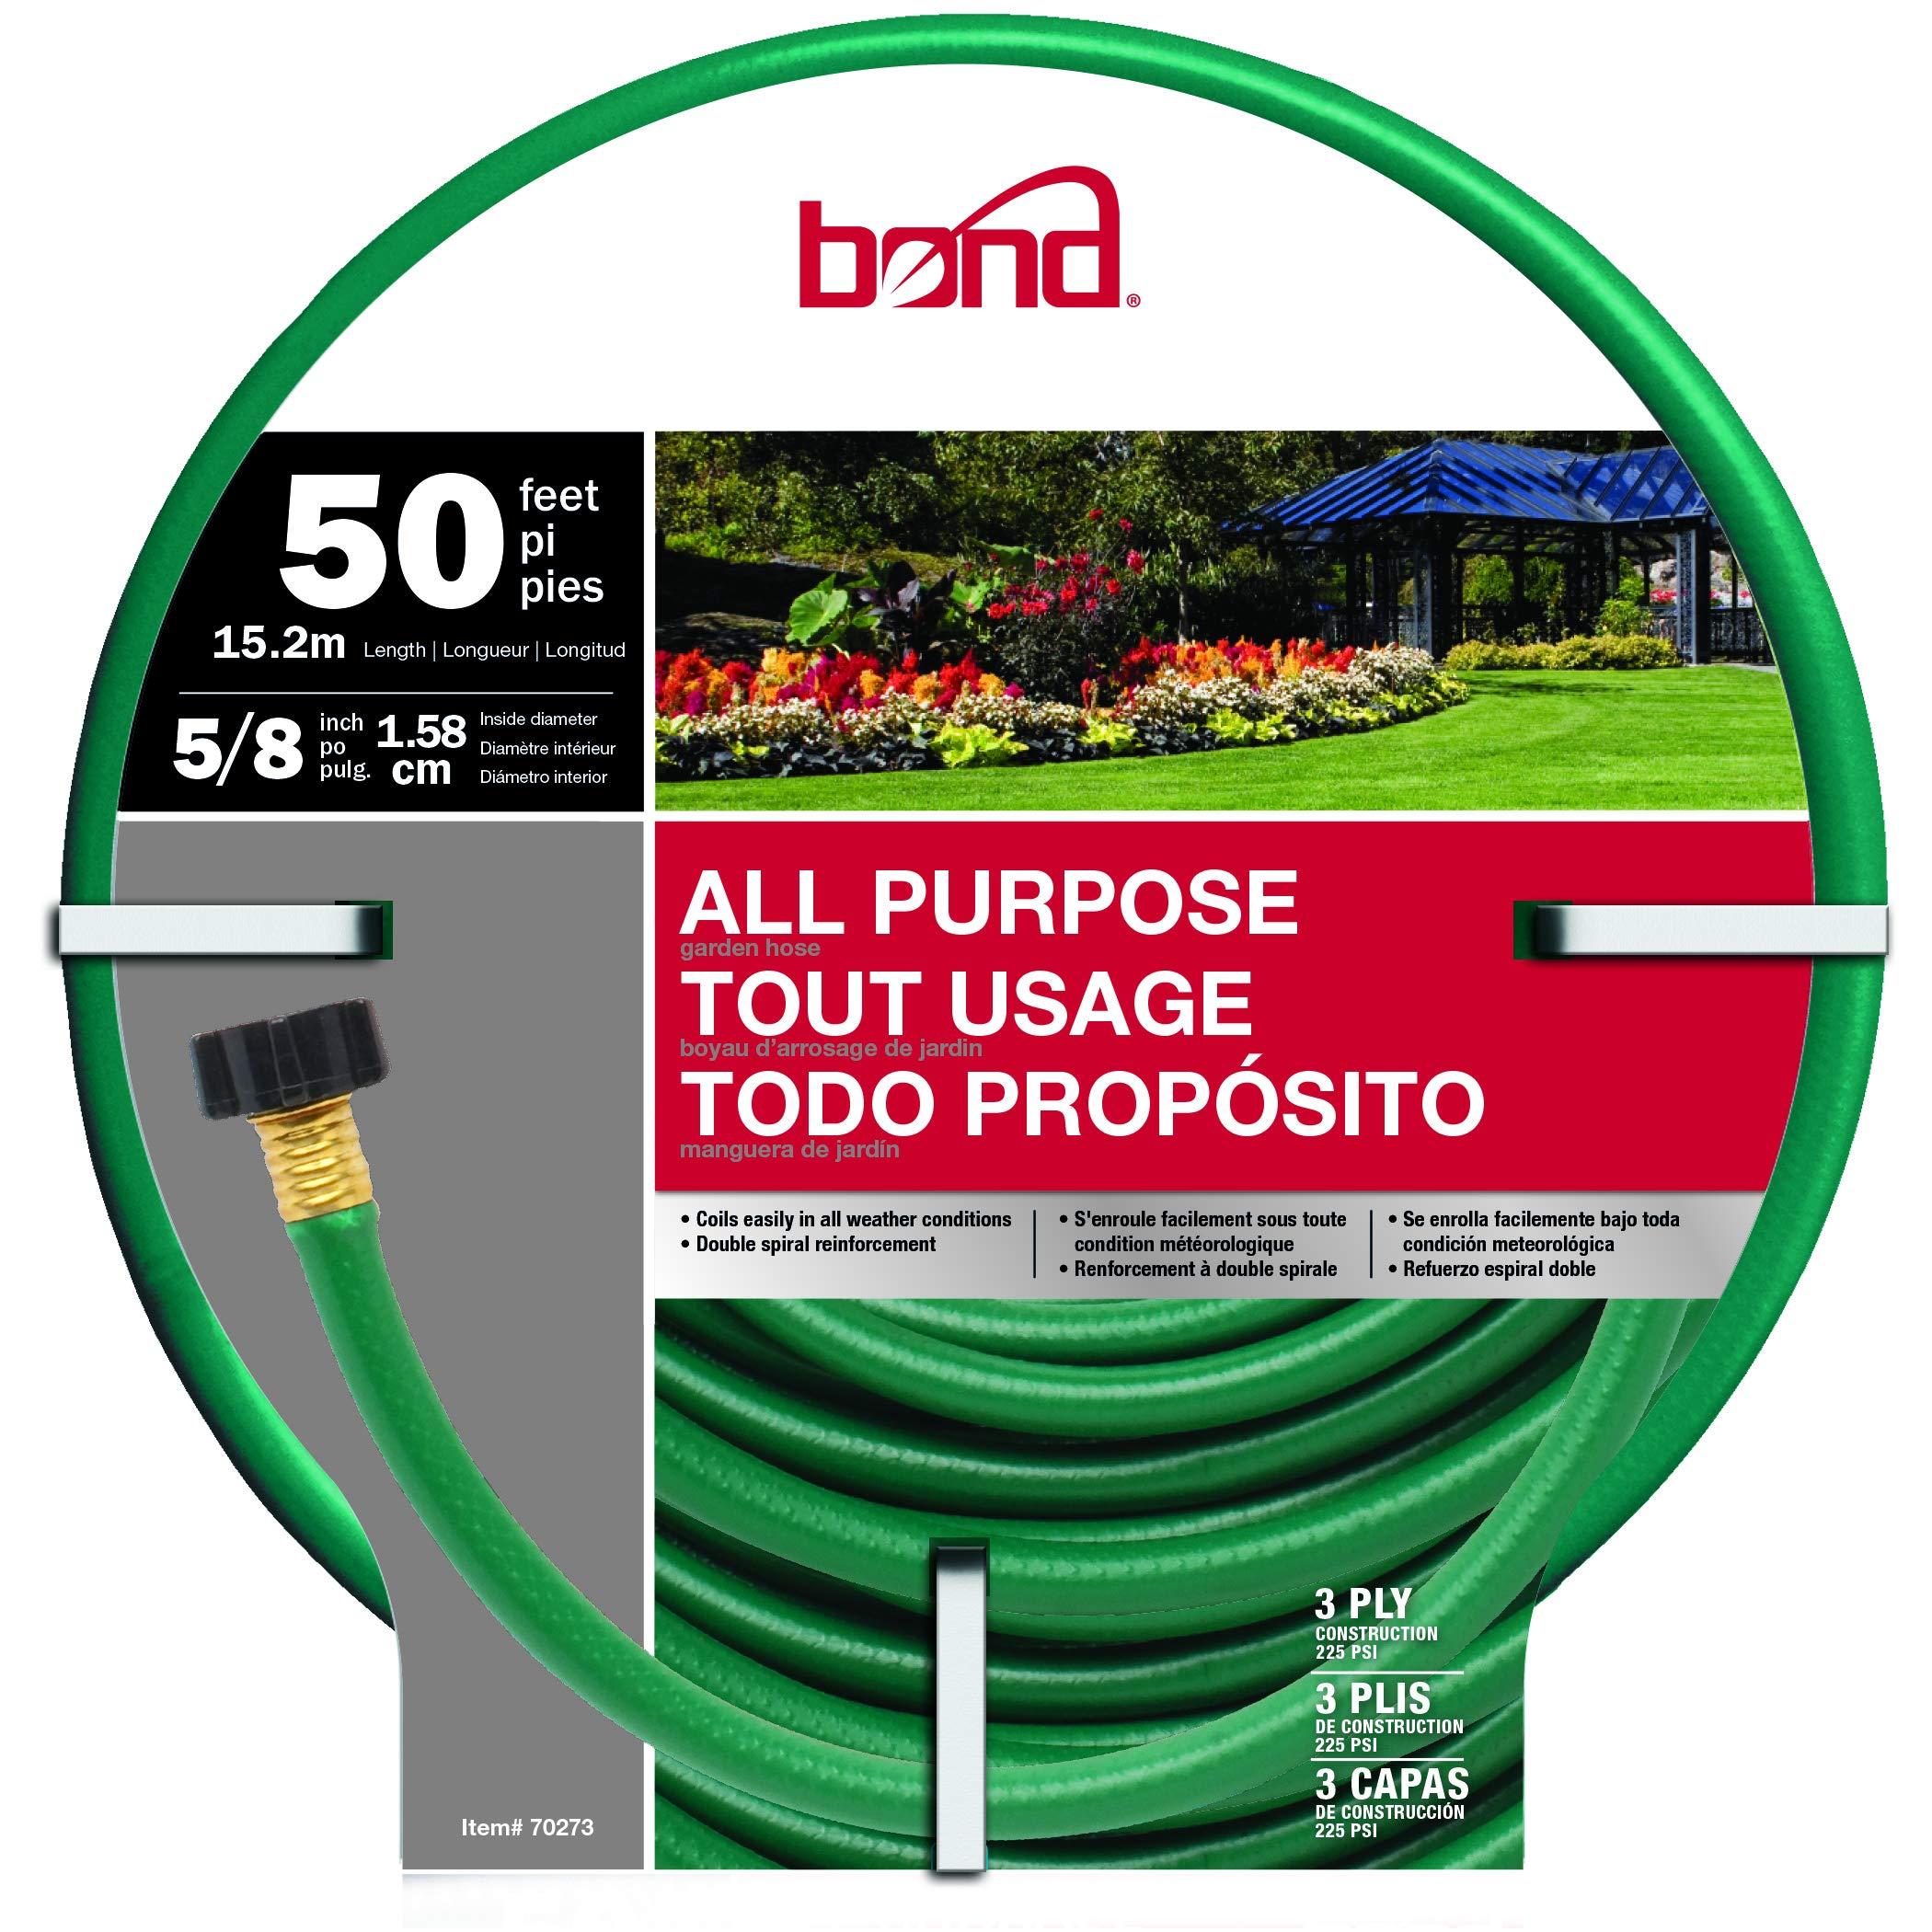 Bond 70273 Light Duty Manguera de jardín de 15 Metros: Amazon.es: Jardín